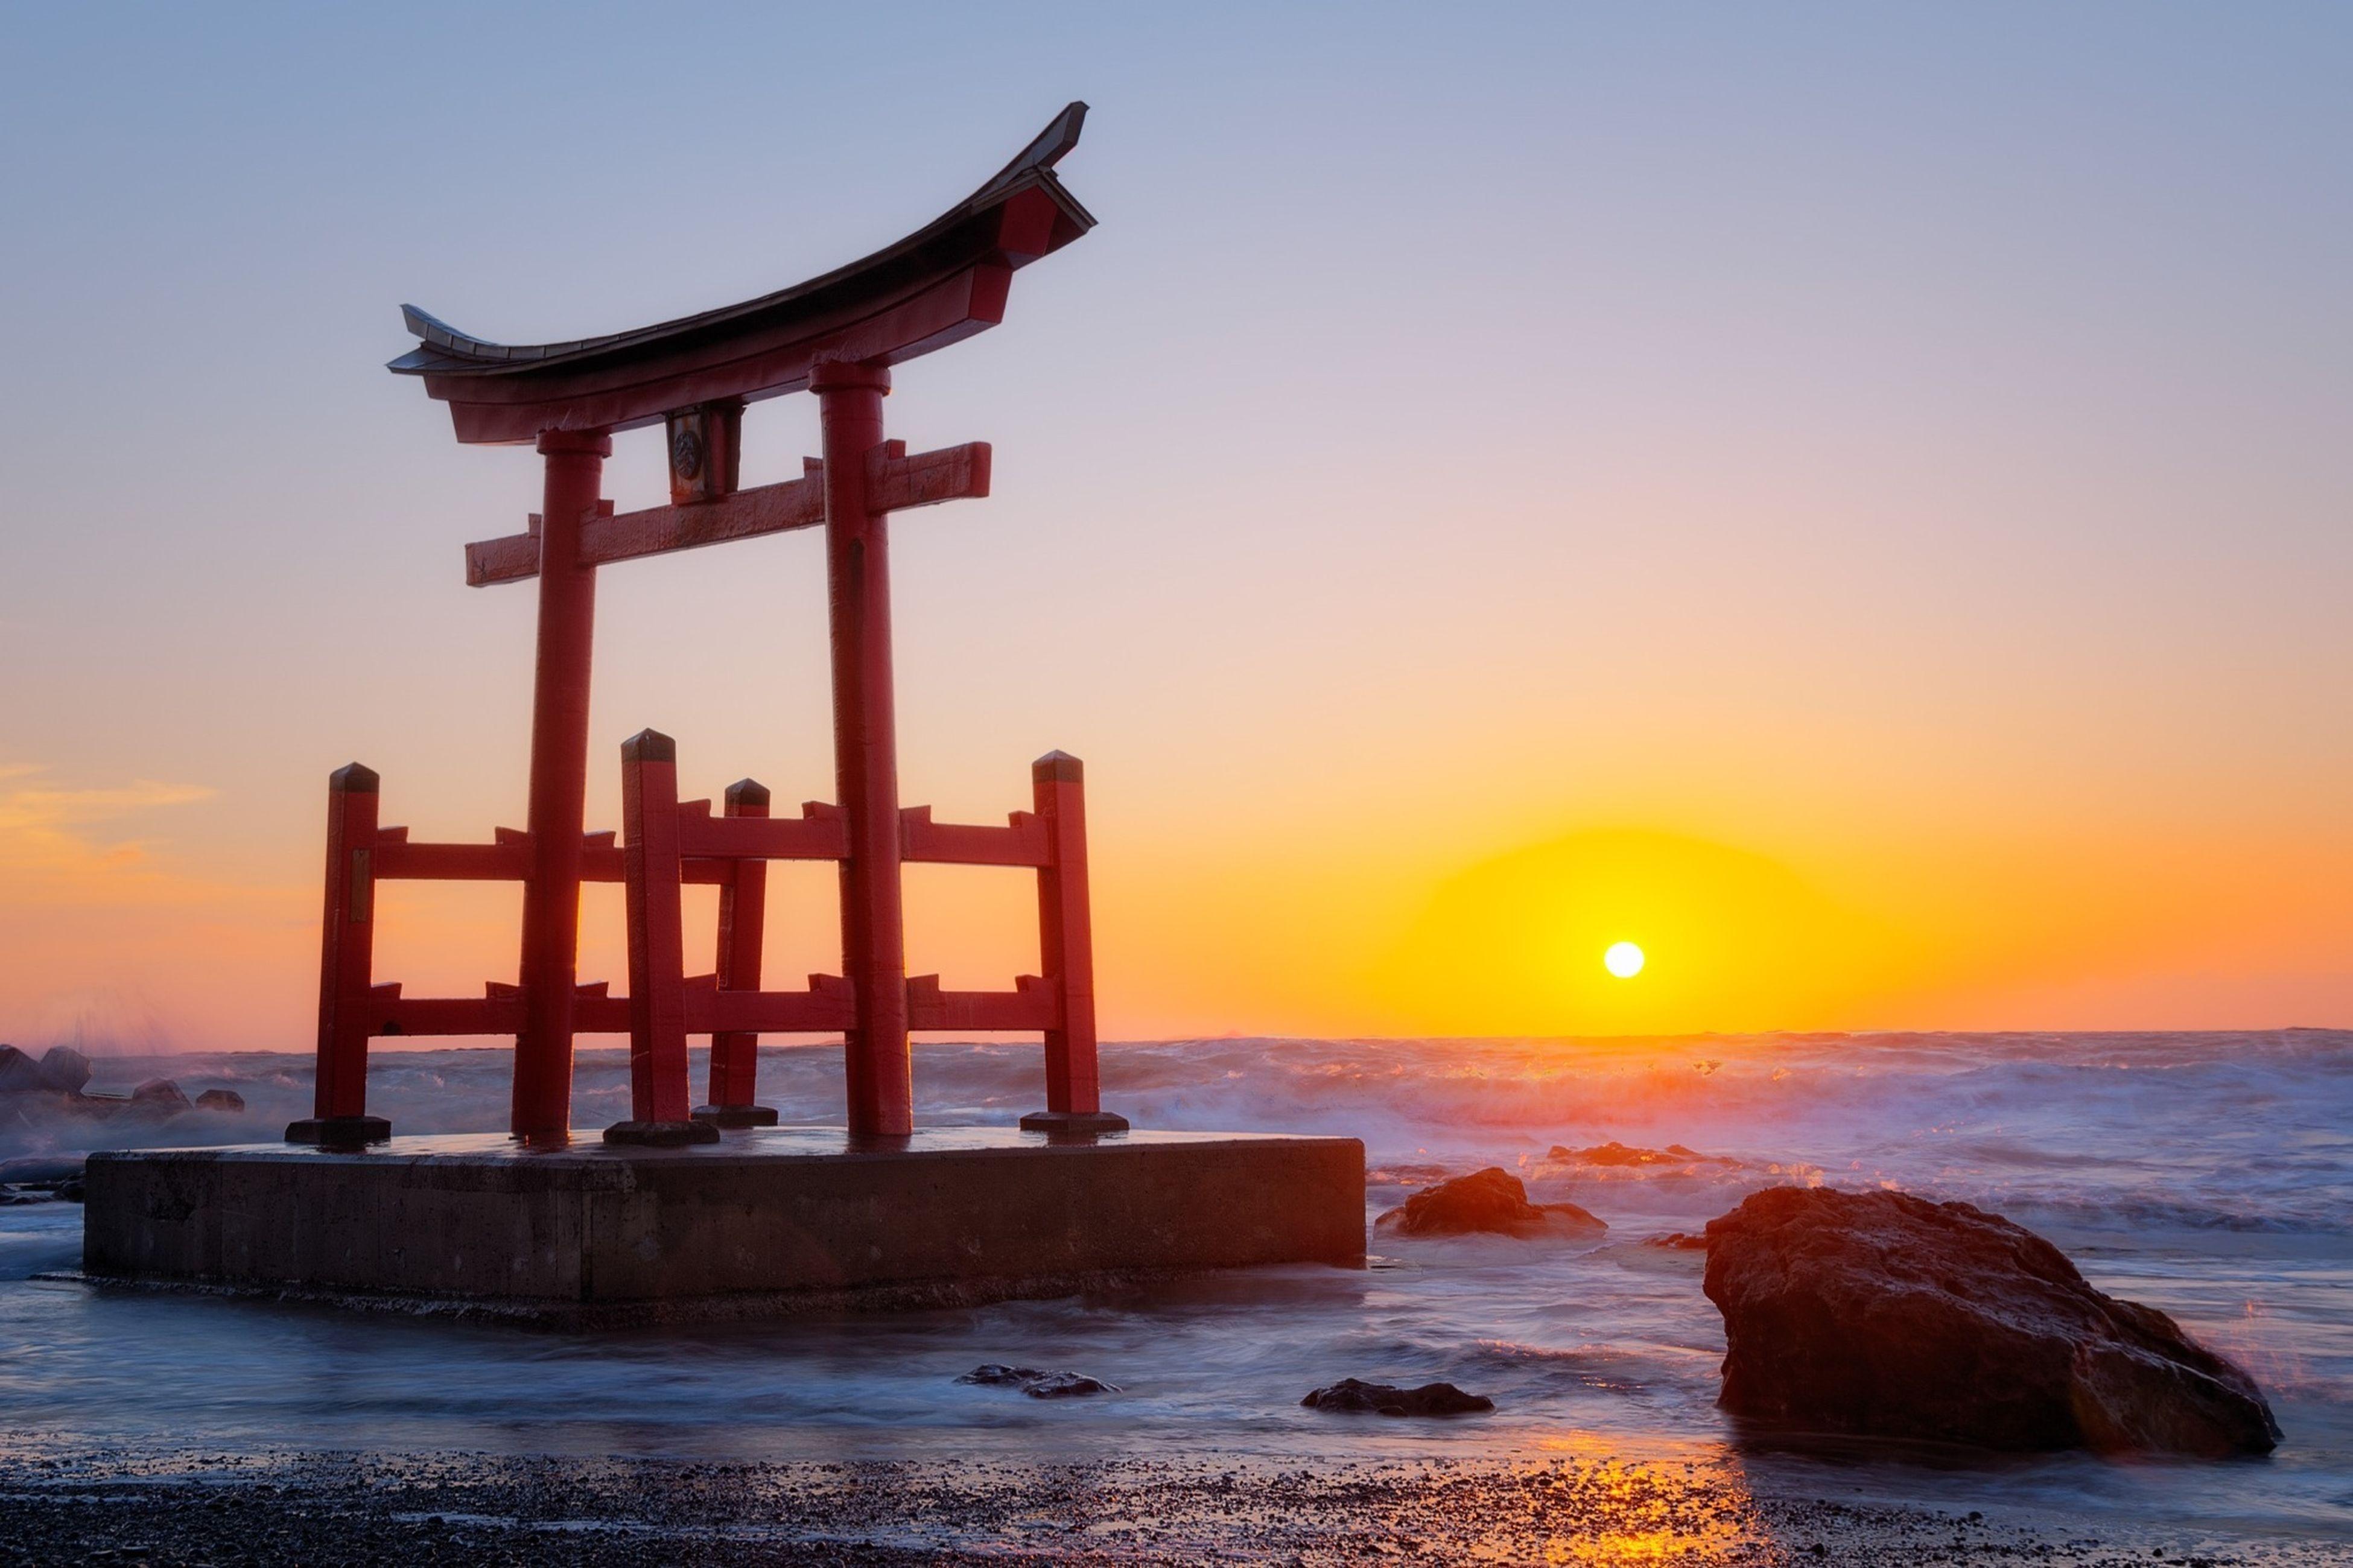 EyeEm Best Shots Sky_collection Sun_collection Sunset